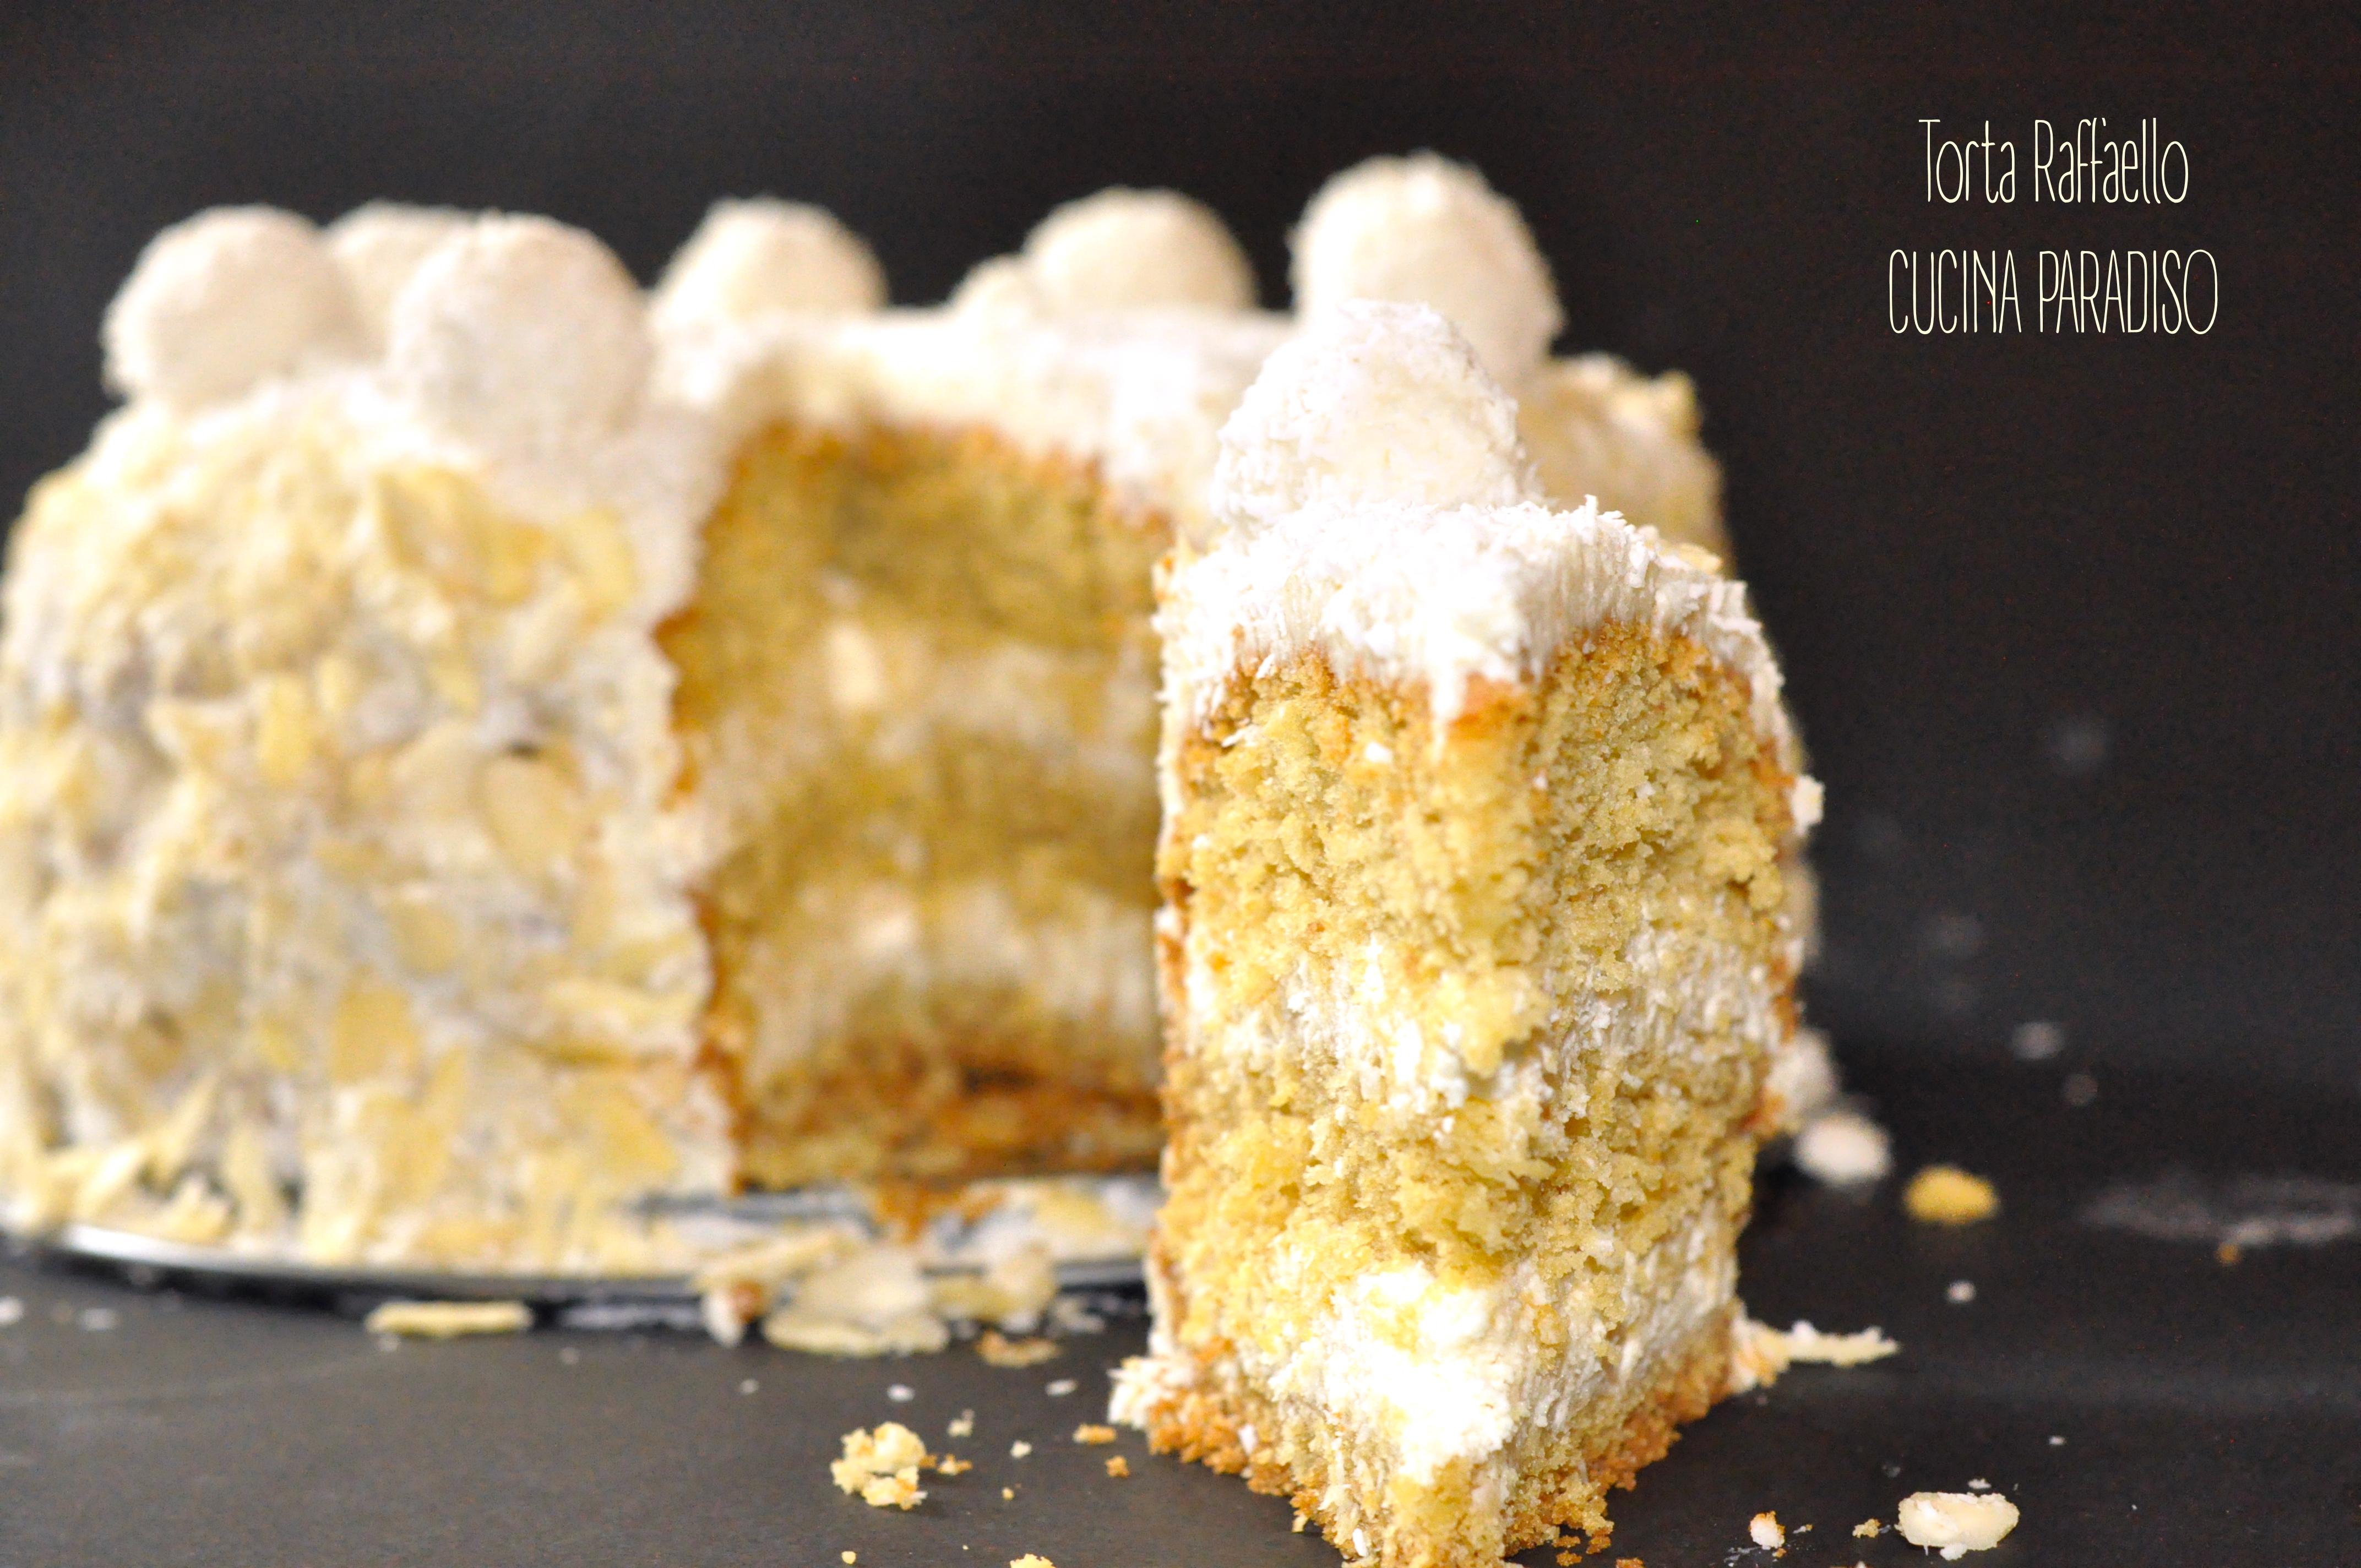 Torta Raffaello3